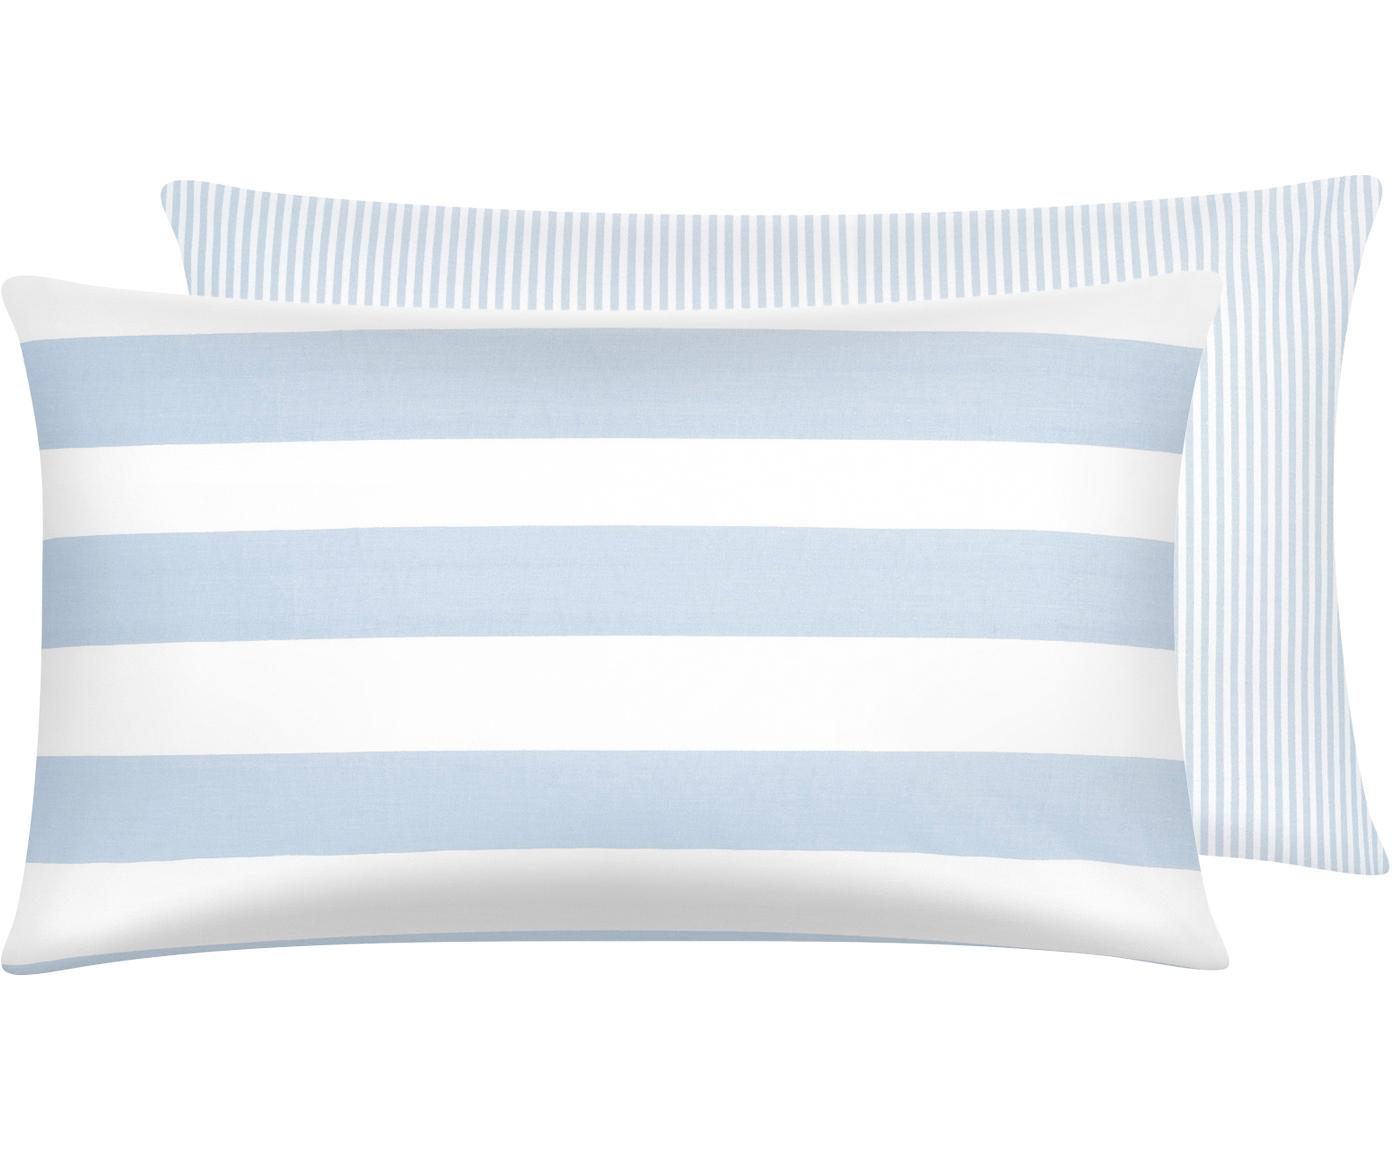 Funda de almohada de tejido renforcé Lorena, caras distintas, Azul claro, blanco crema, An 50 x L 70 cm